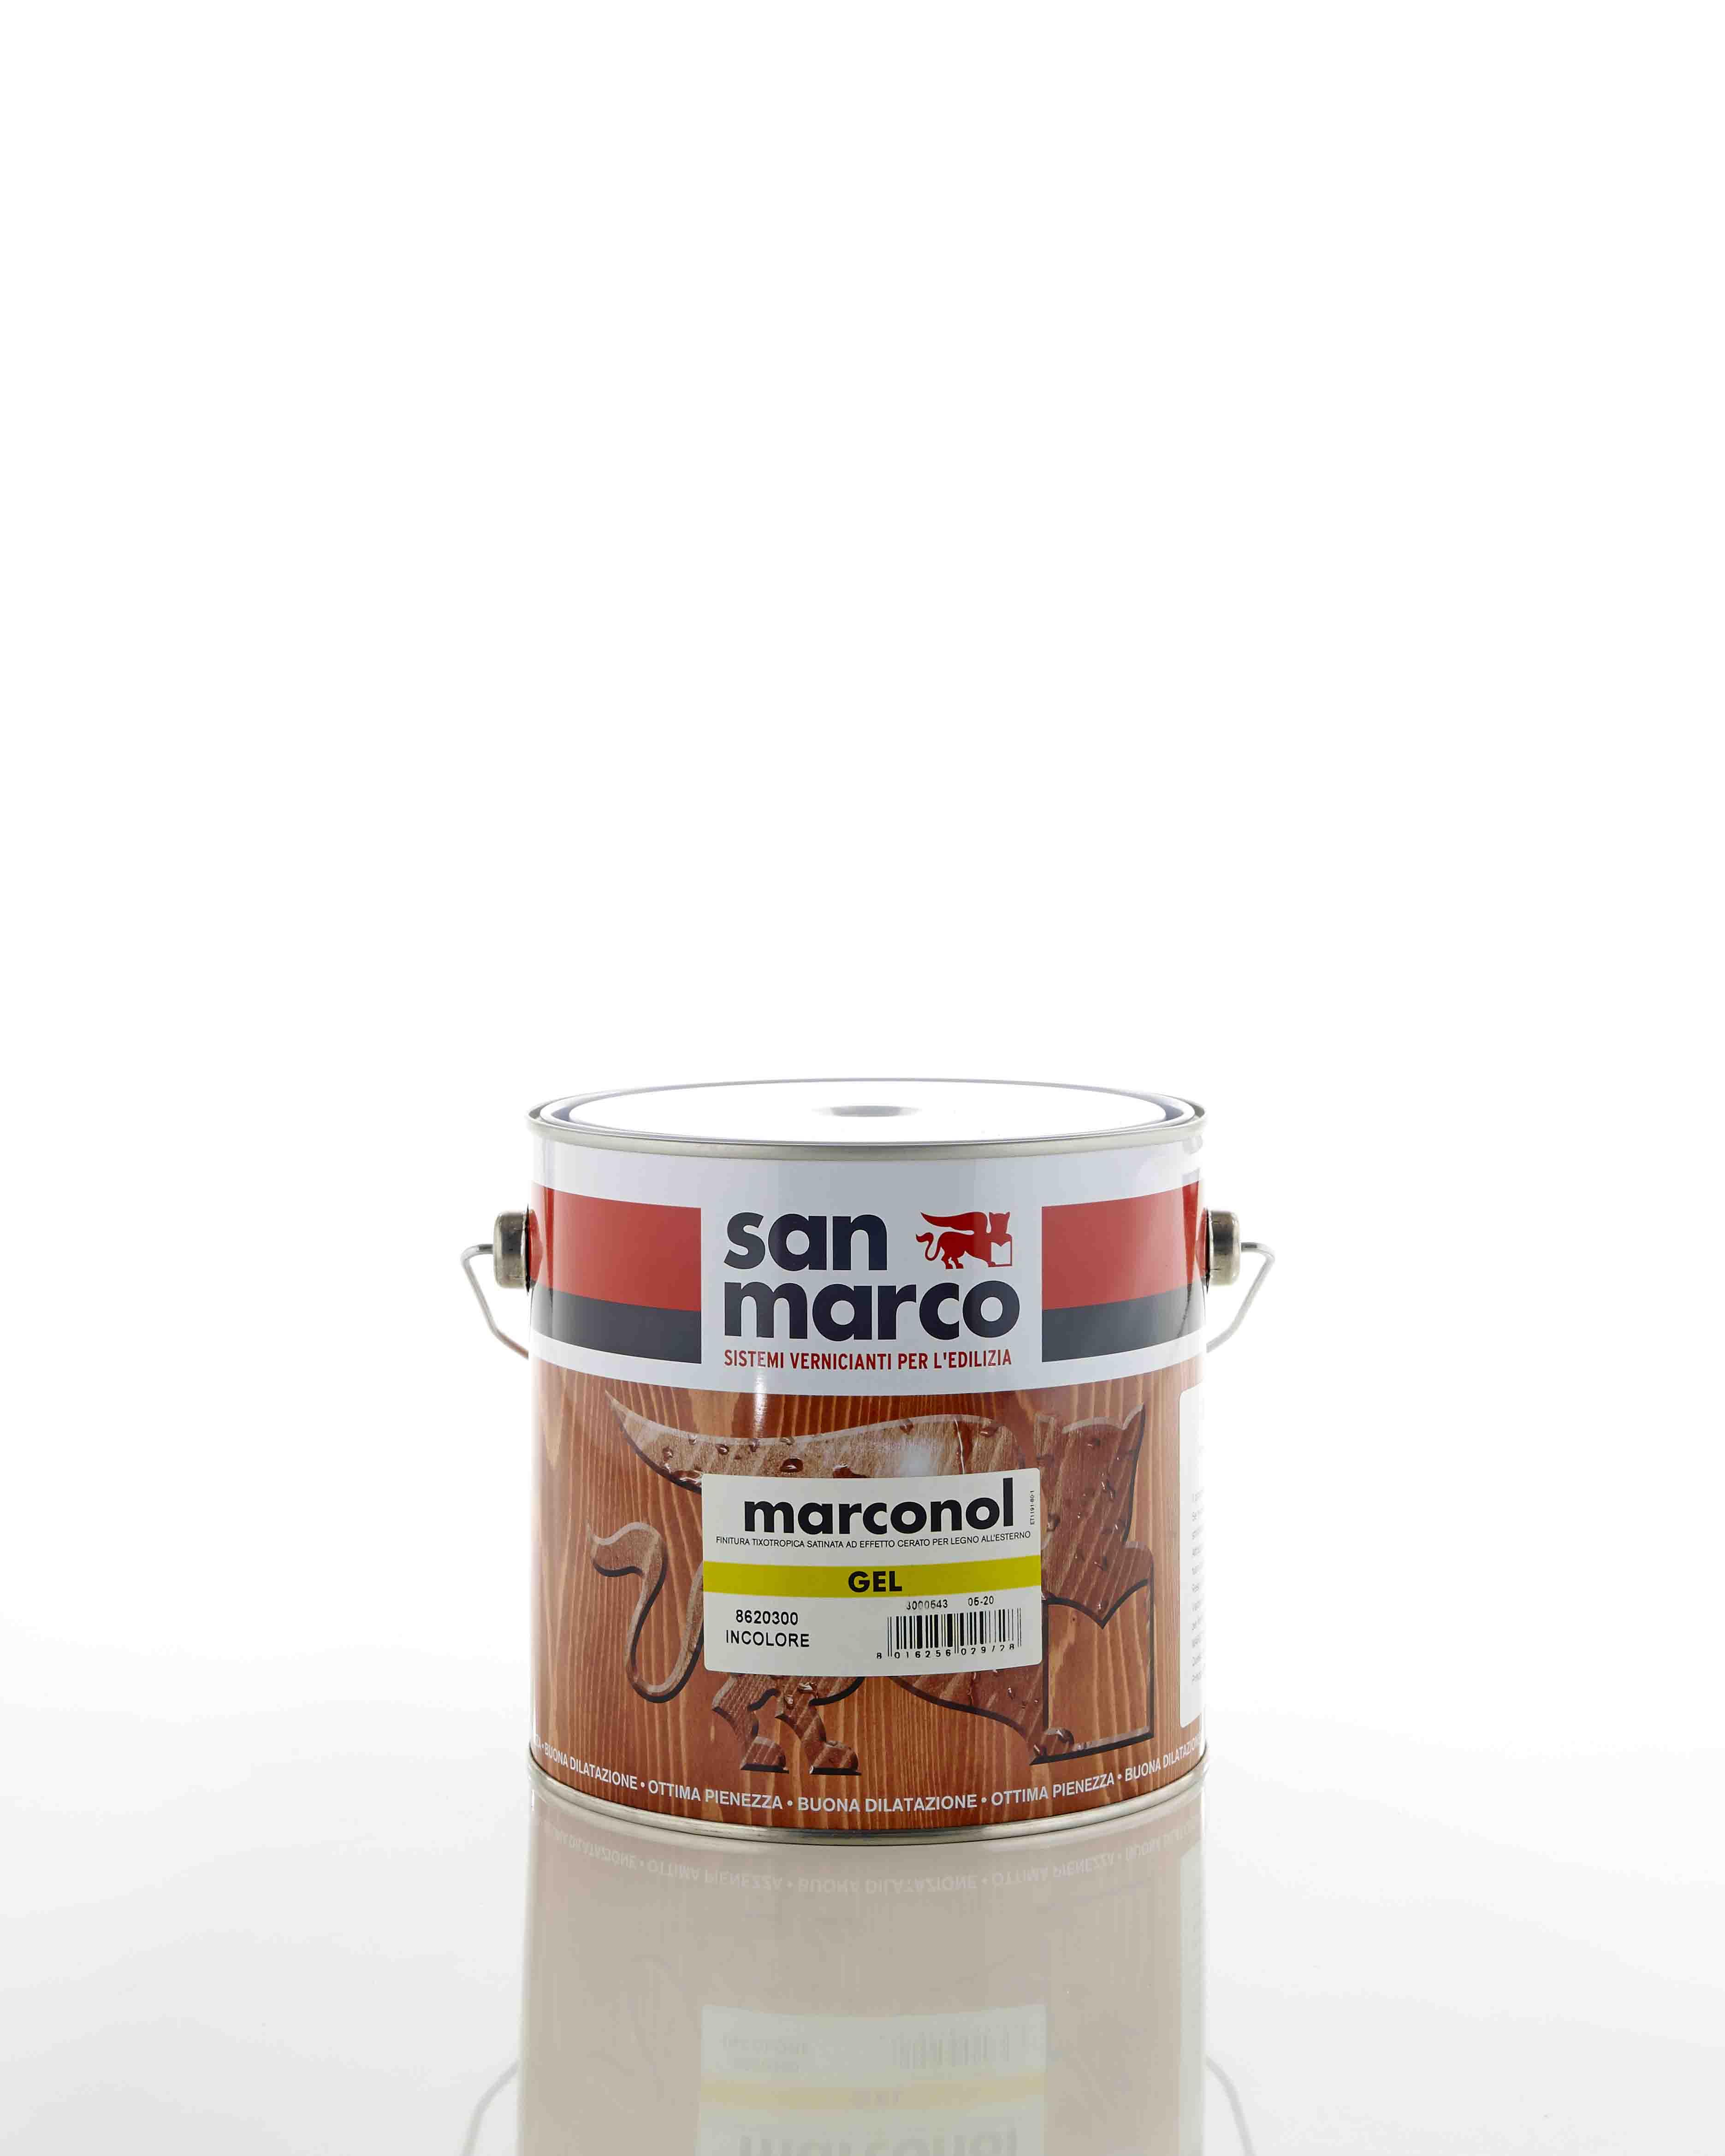 MARCONOL GEL